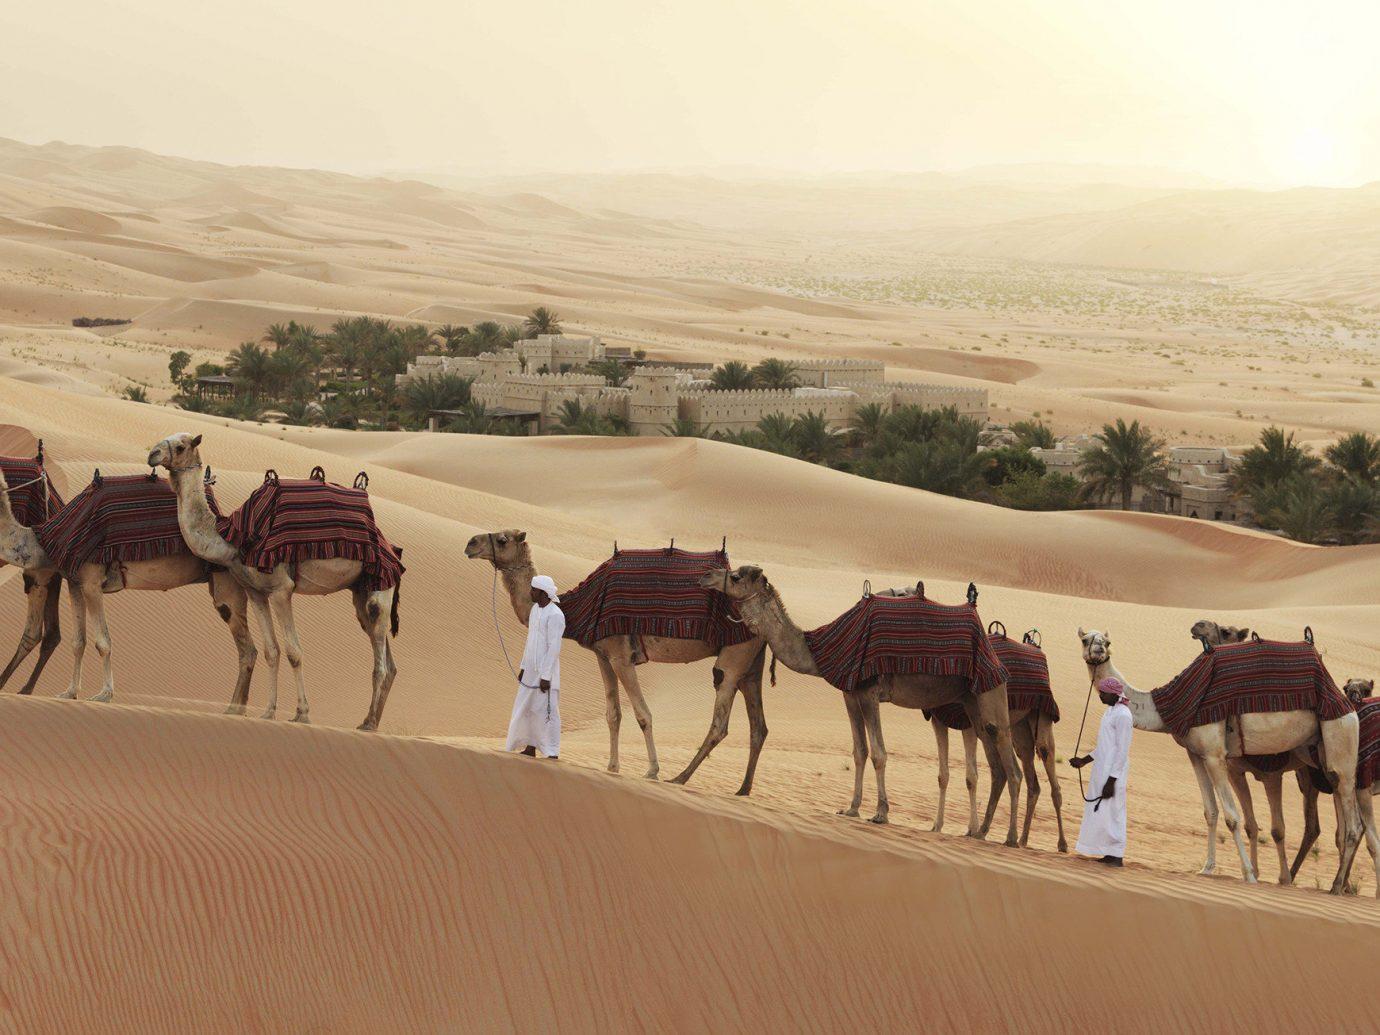 Beauty Trip Ideas sky outdoor Camel natural environment landform sahara Desert geographical feature aeolian landform erg cross arabian camel landscape camel like mammal herd mustang horse group wadi cattle line several